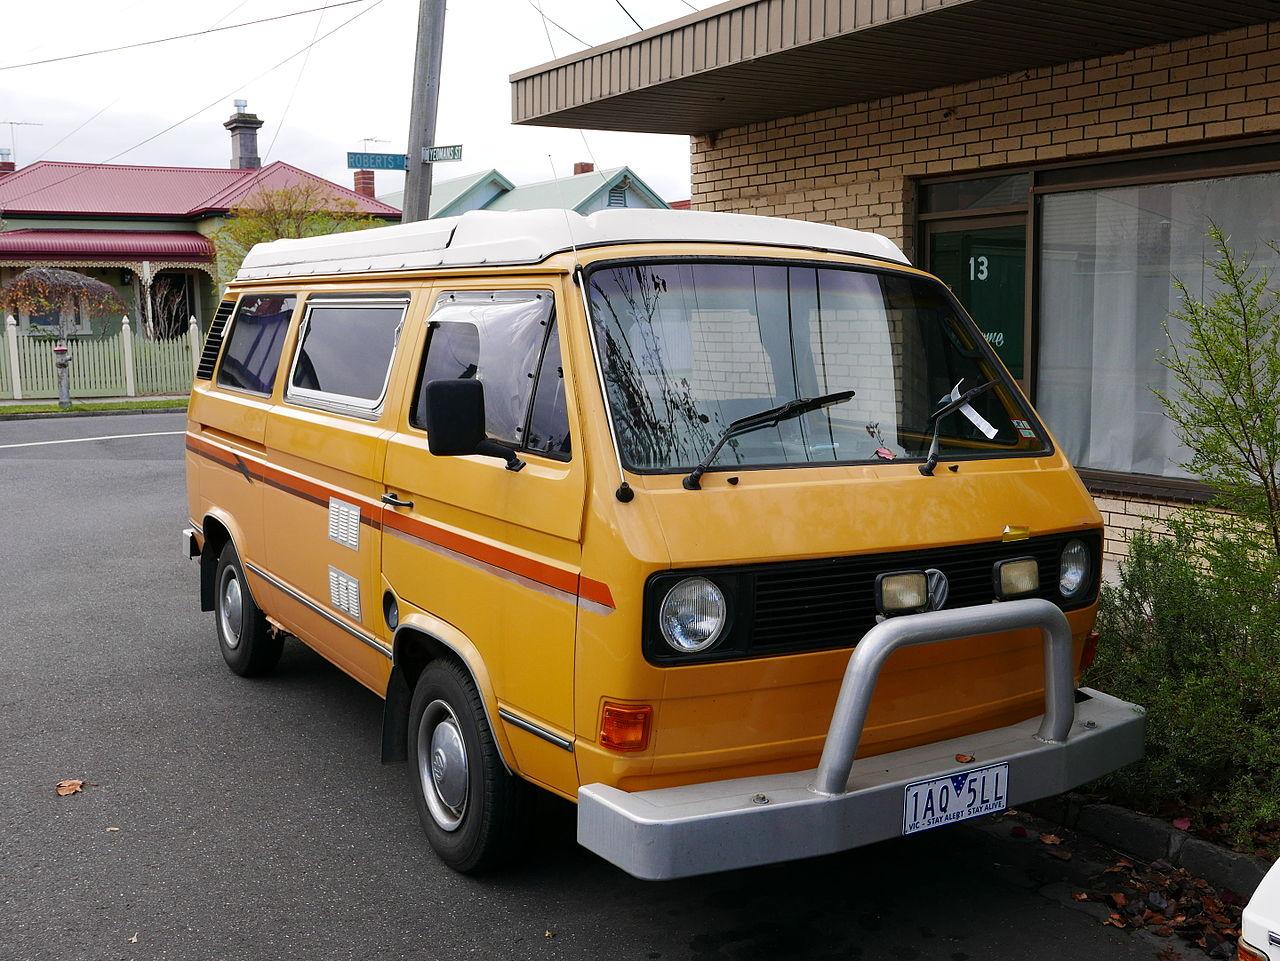 Vw Camper Van >> File:1982 Volkswagen Transporter (T3) van, Sunliner camper conversion (2015-06-03) 01.jpg ...